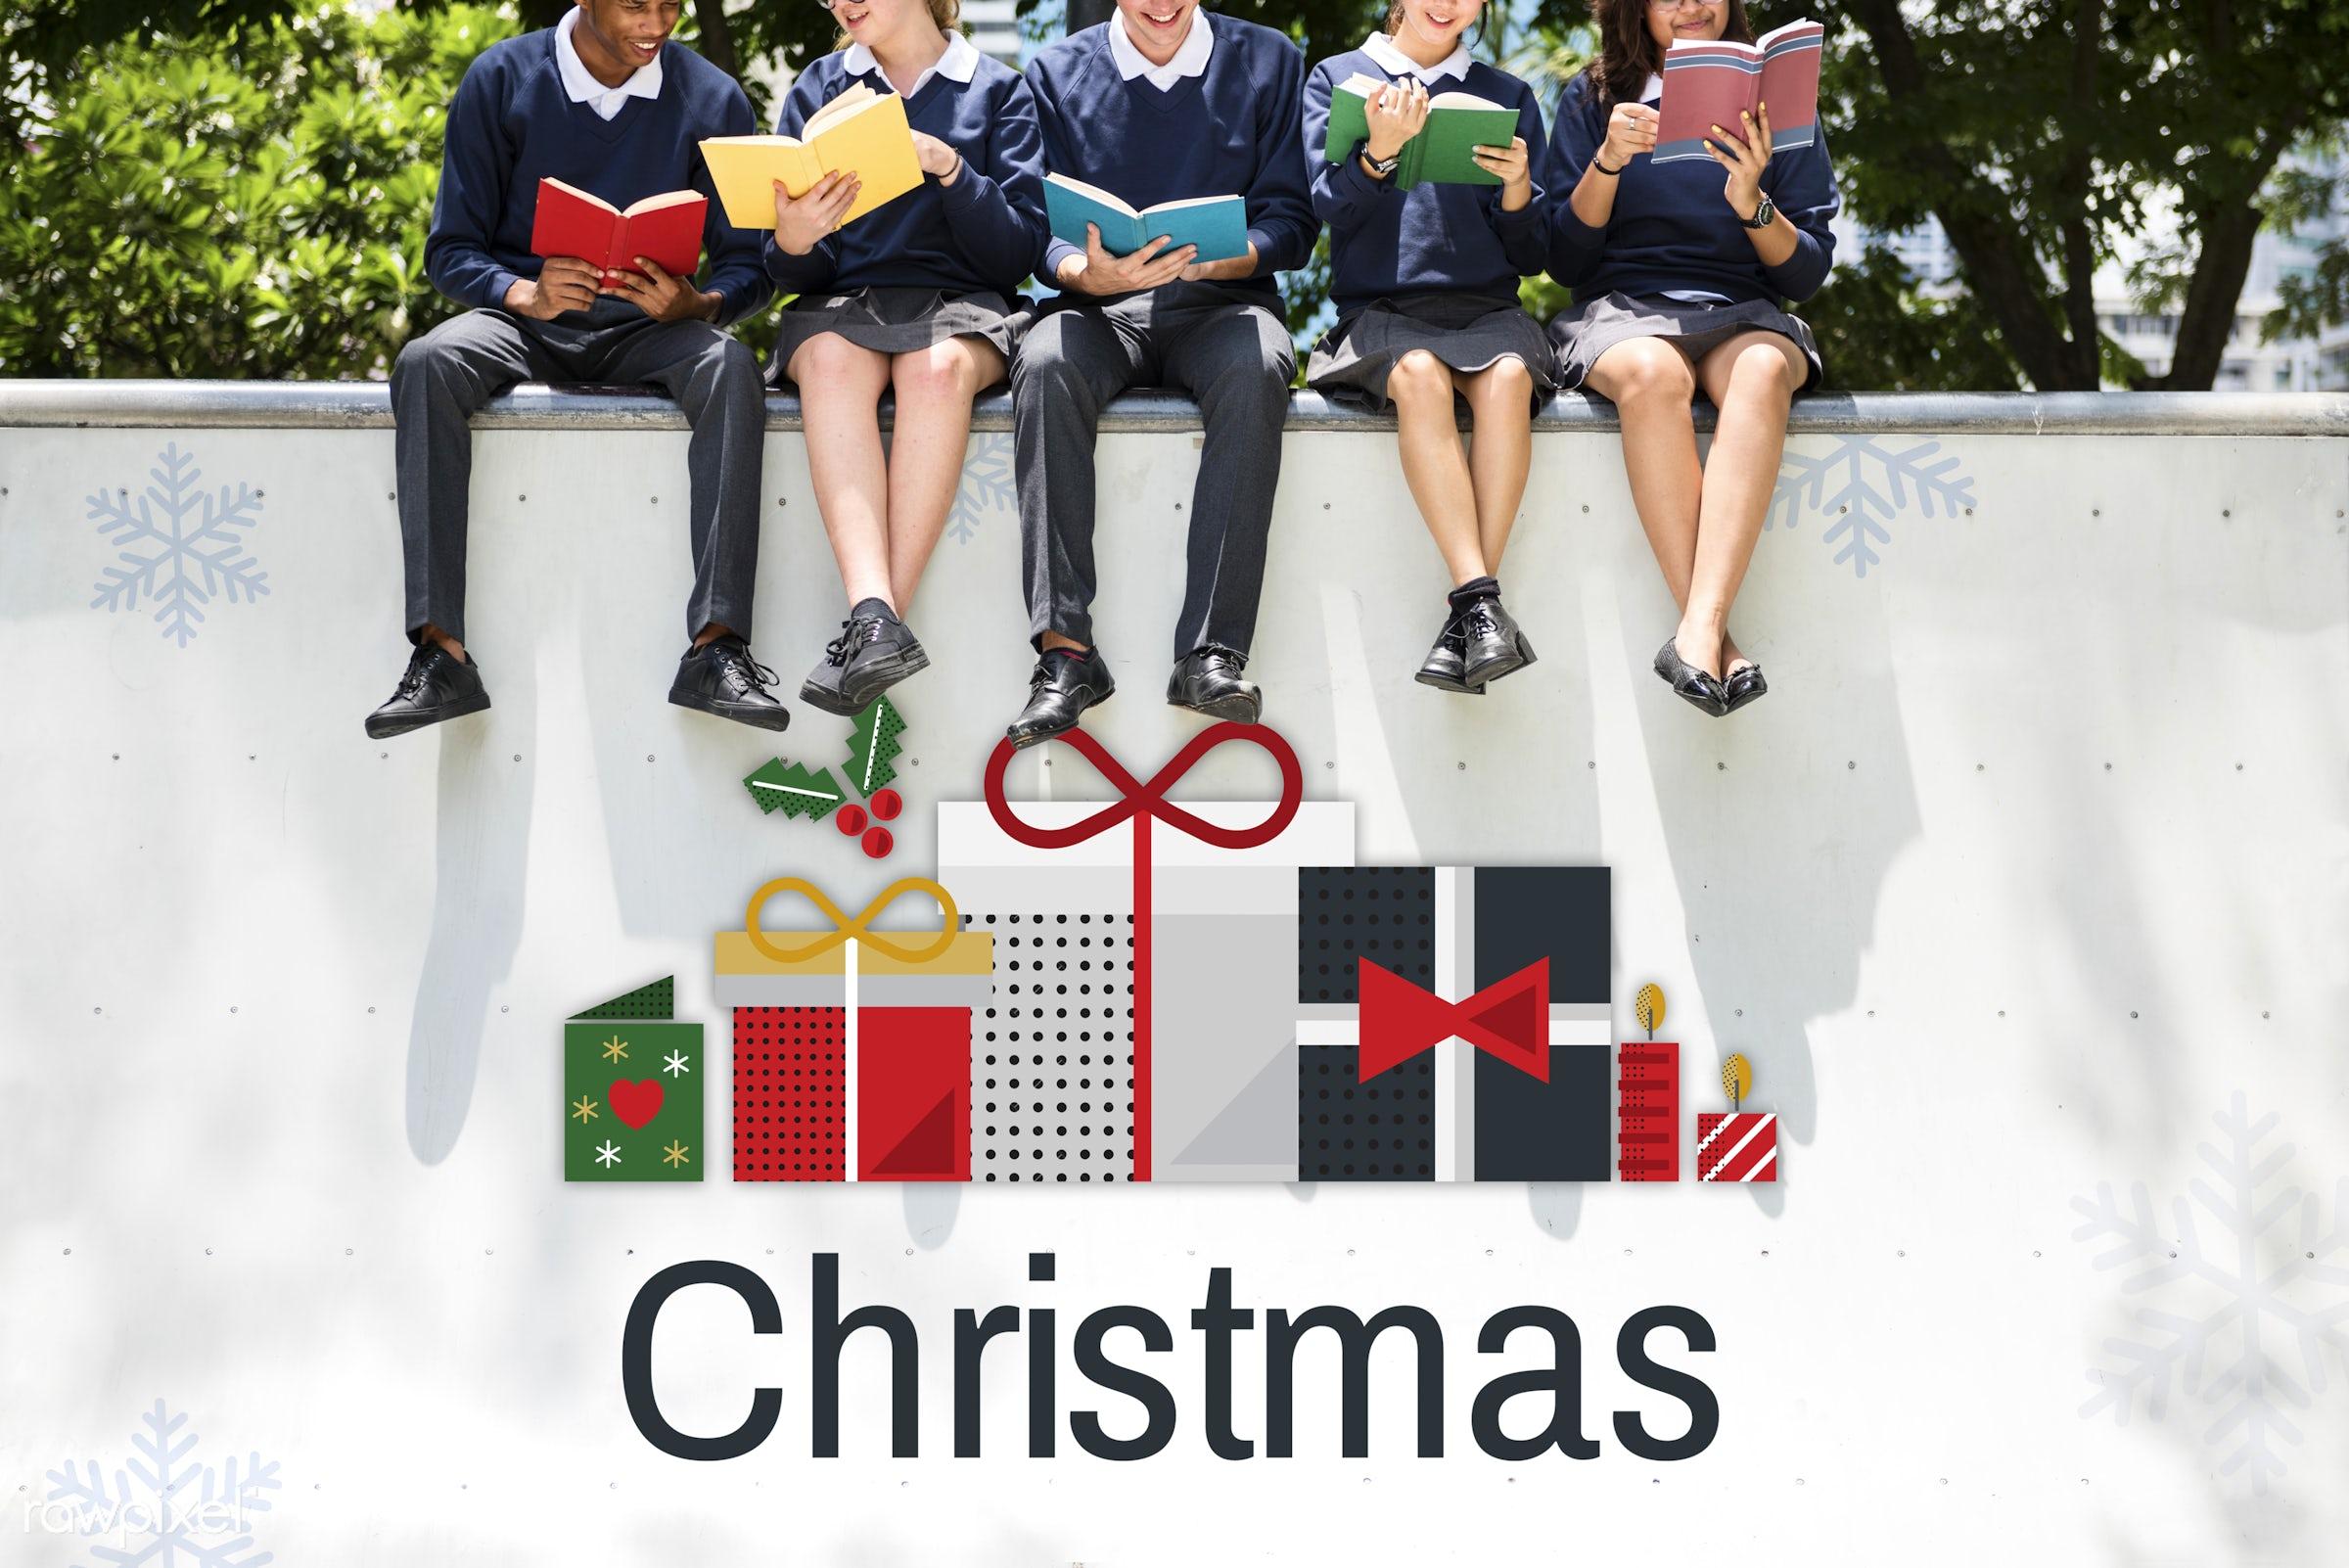 best wishes, books, celebration, christmas, class, college, confetti, decoration, diversity, friends, friendship, gift,...